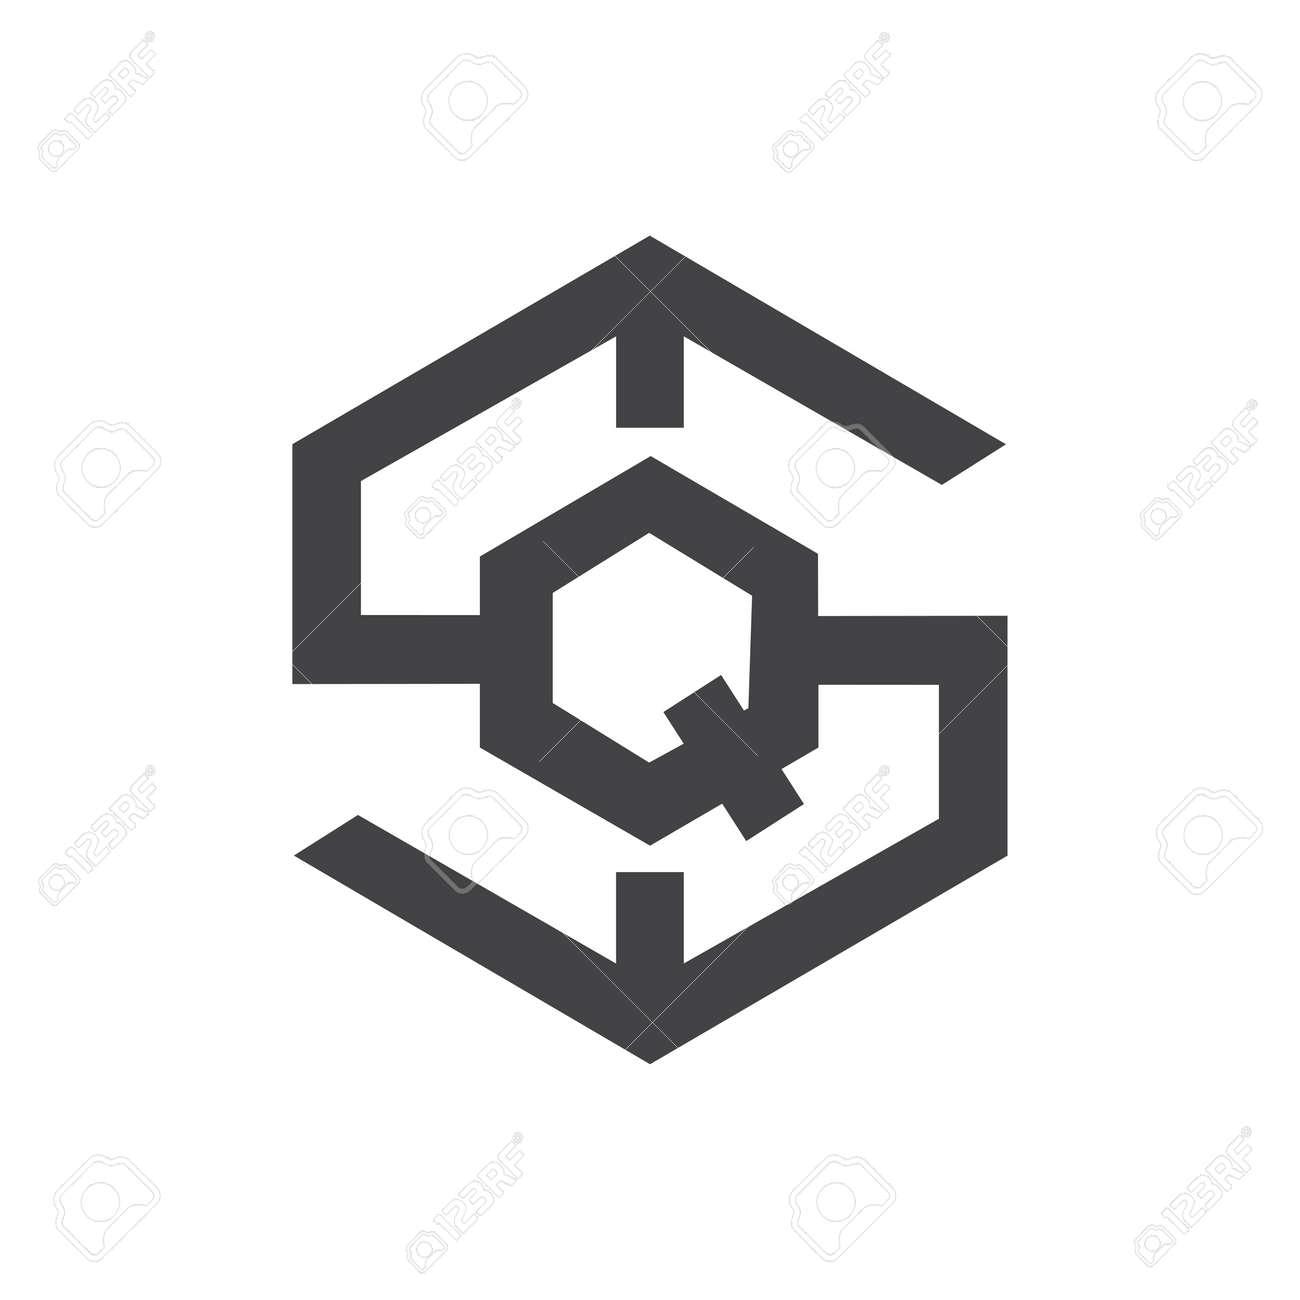 Initial qs letter logo vector template design. Linked letter sq logo design. Simple qs vector template. - 167614315